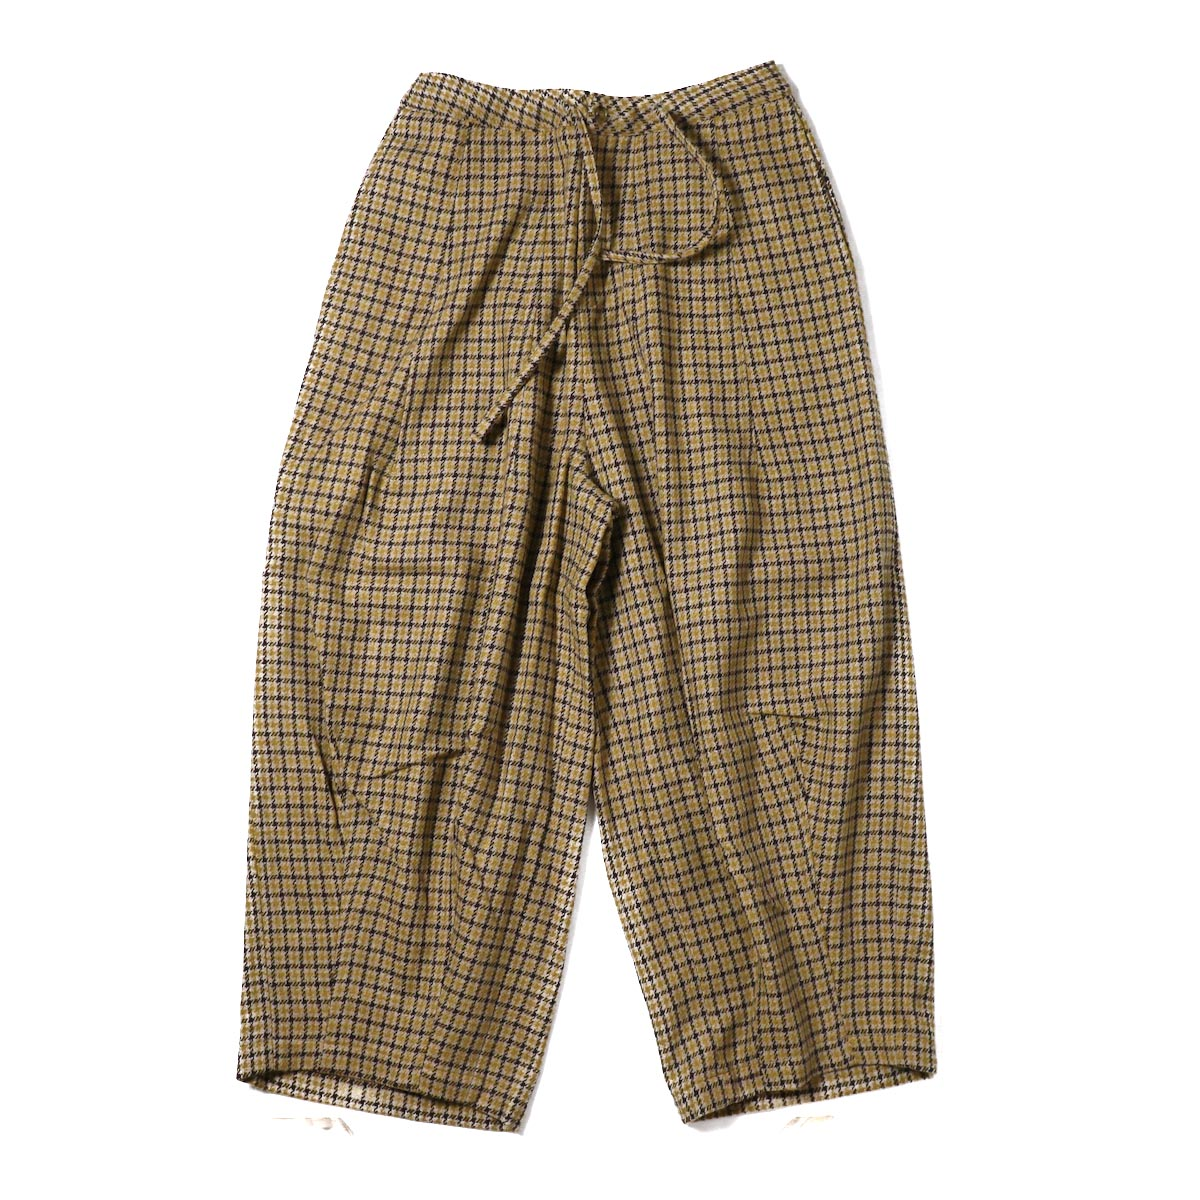 NEEDLES (WOMENS) / Darts Military Pant W/Pe/A/N Gun Club Plaid -BROWN / YELLOW